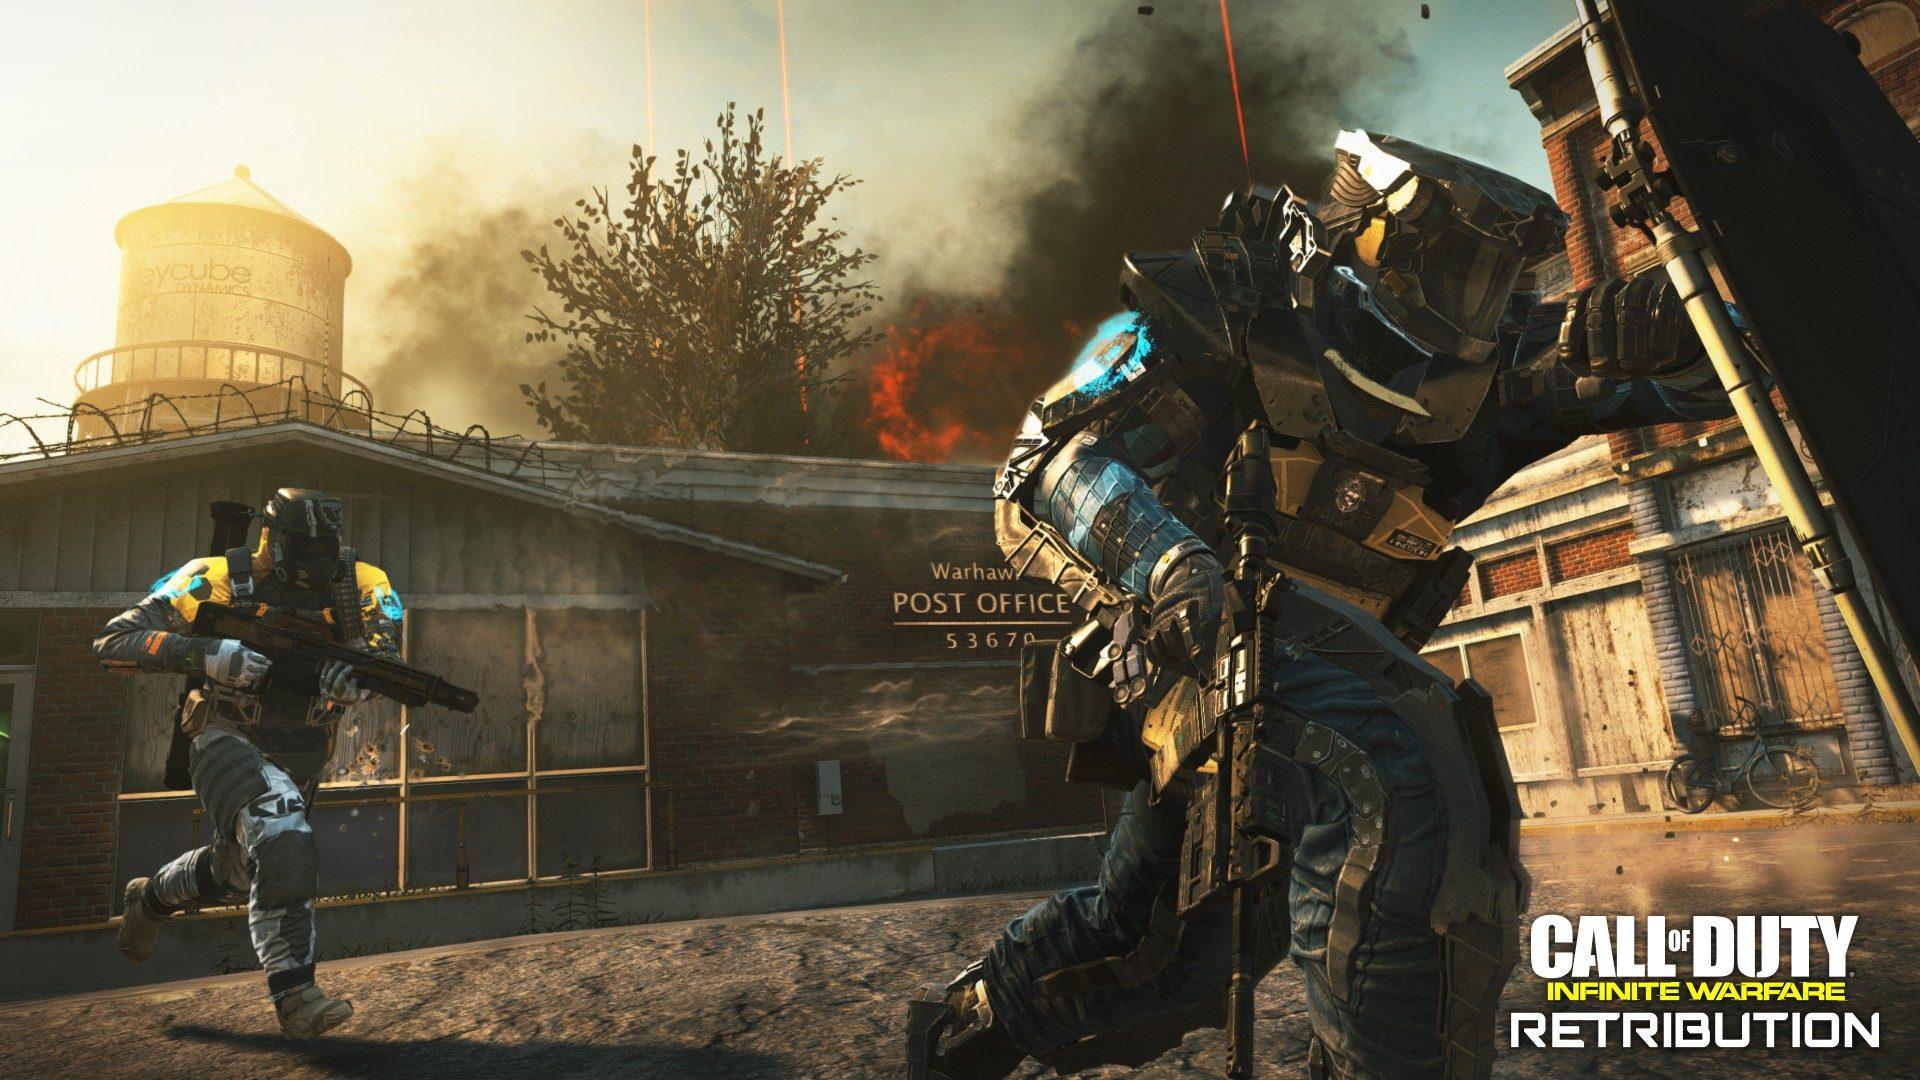 Call of Duty: Infinite Warfare - Retribution